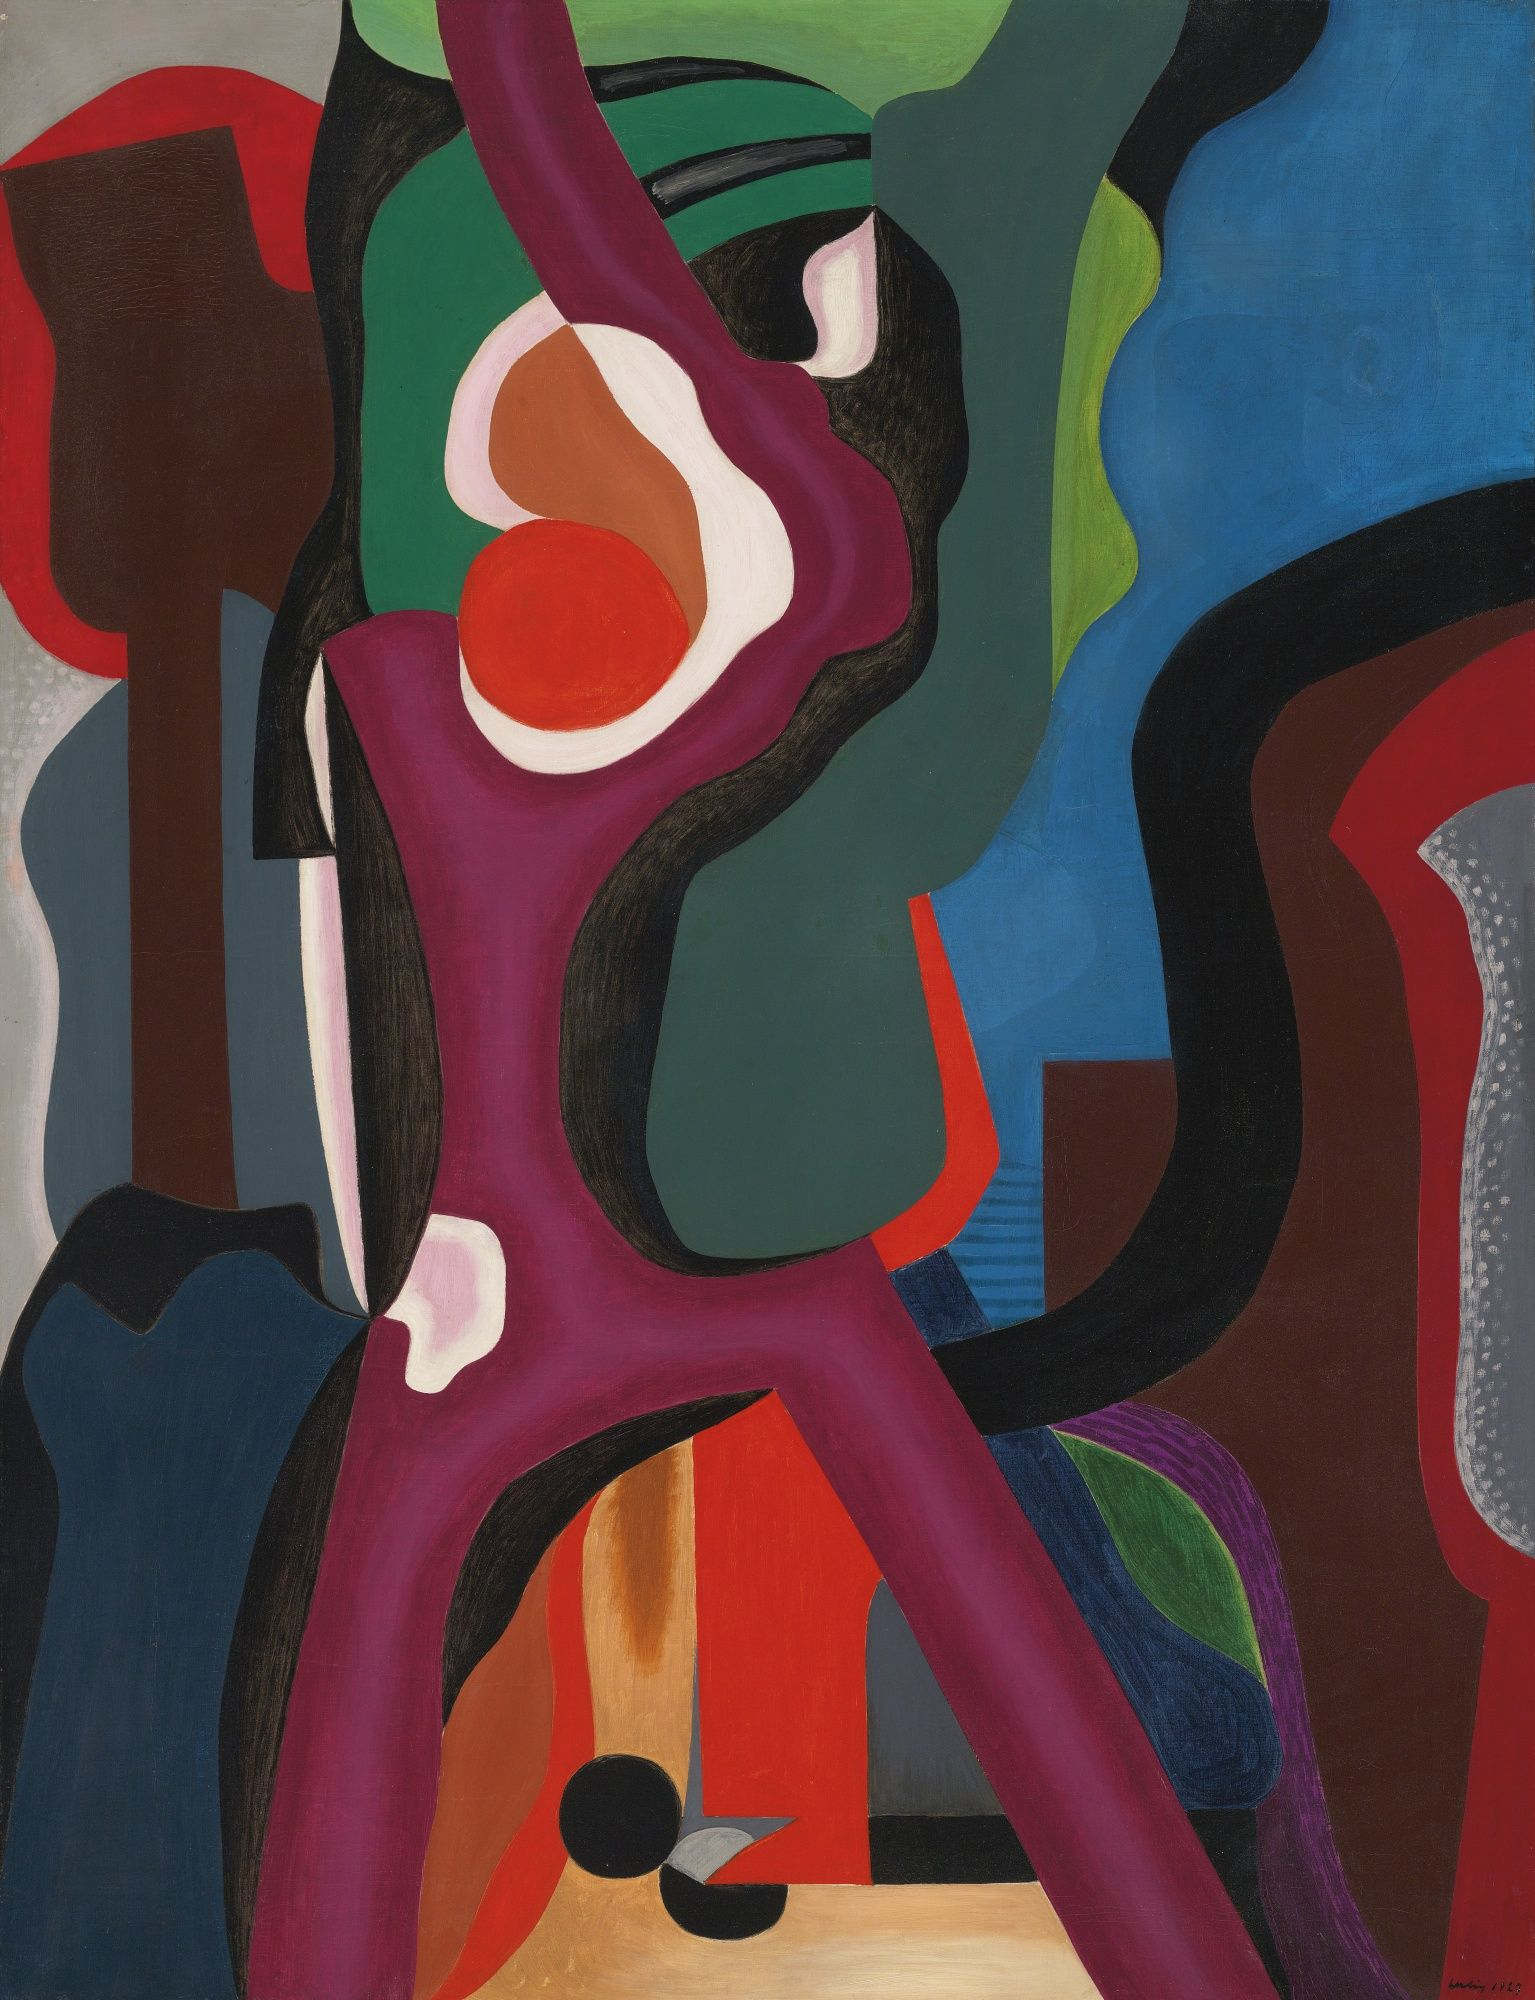 'Composition (Grande vitesse domicile' by Auguste Herbin, 1927